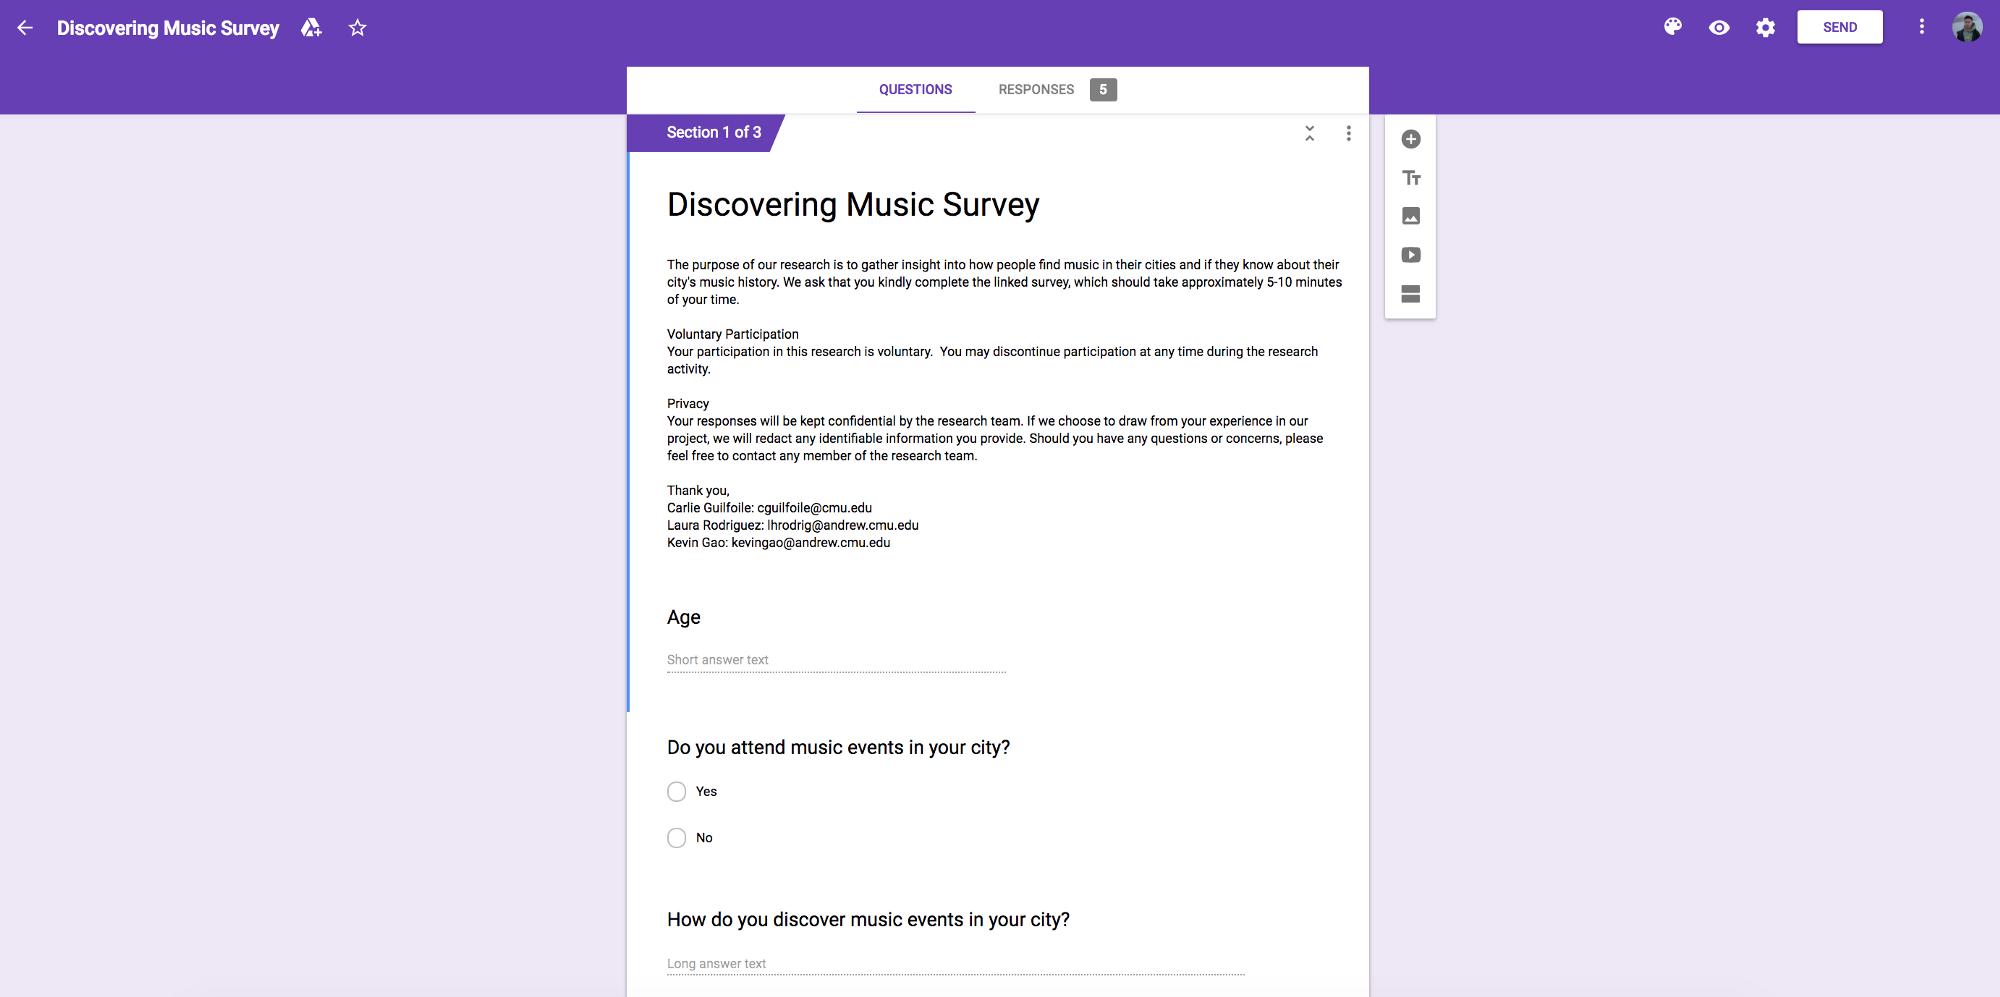 Survey Screen Shot 1.png